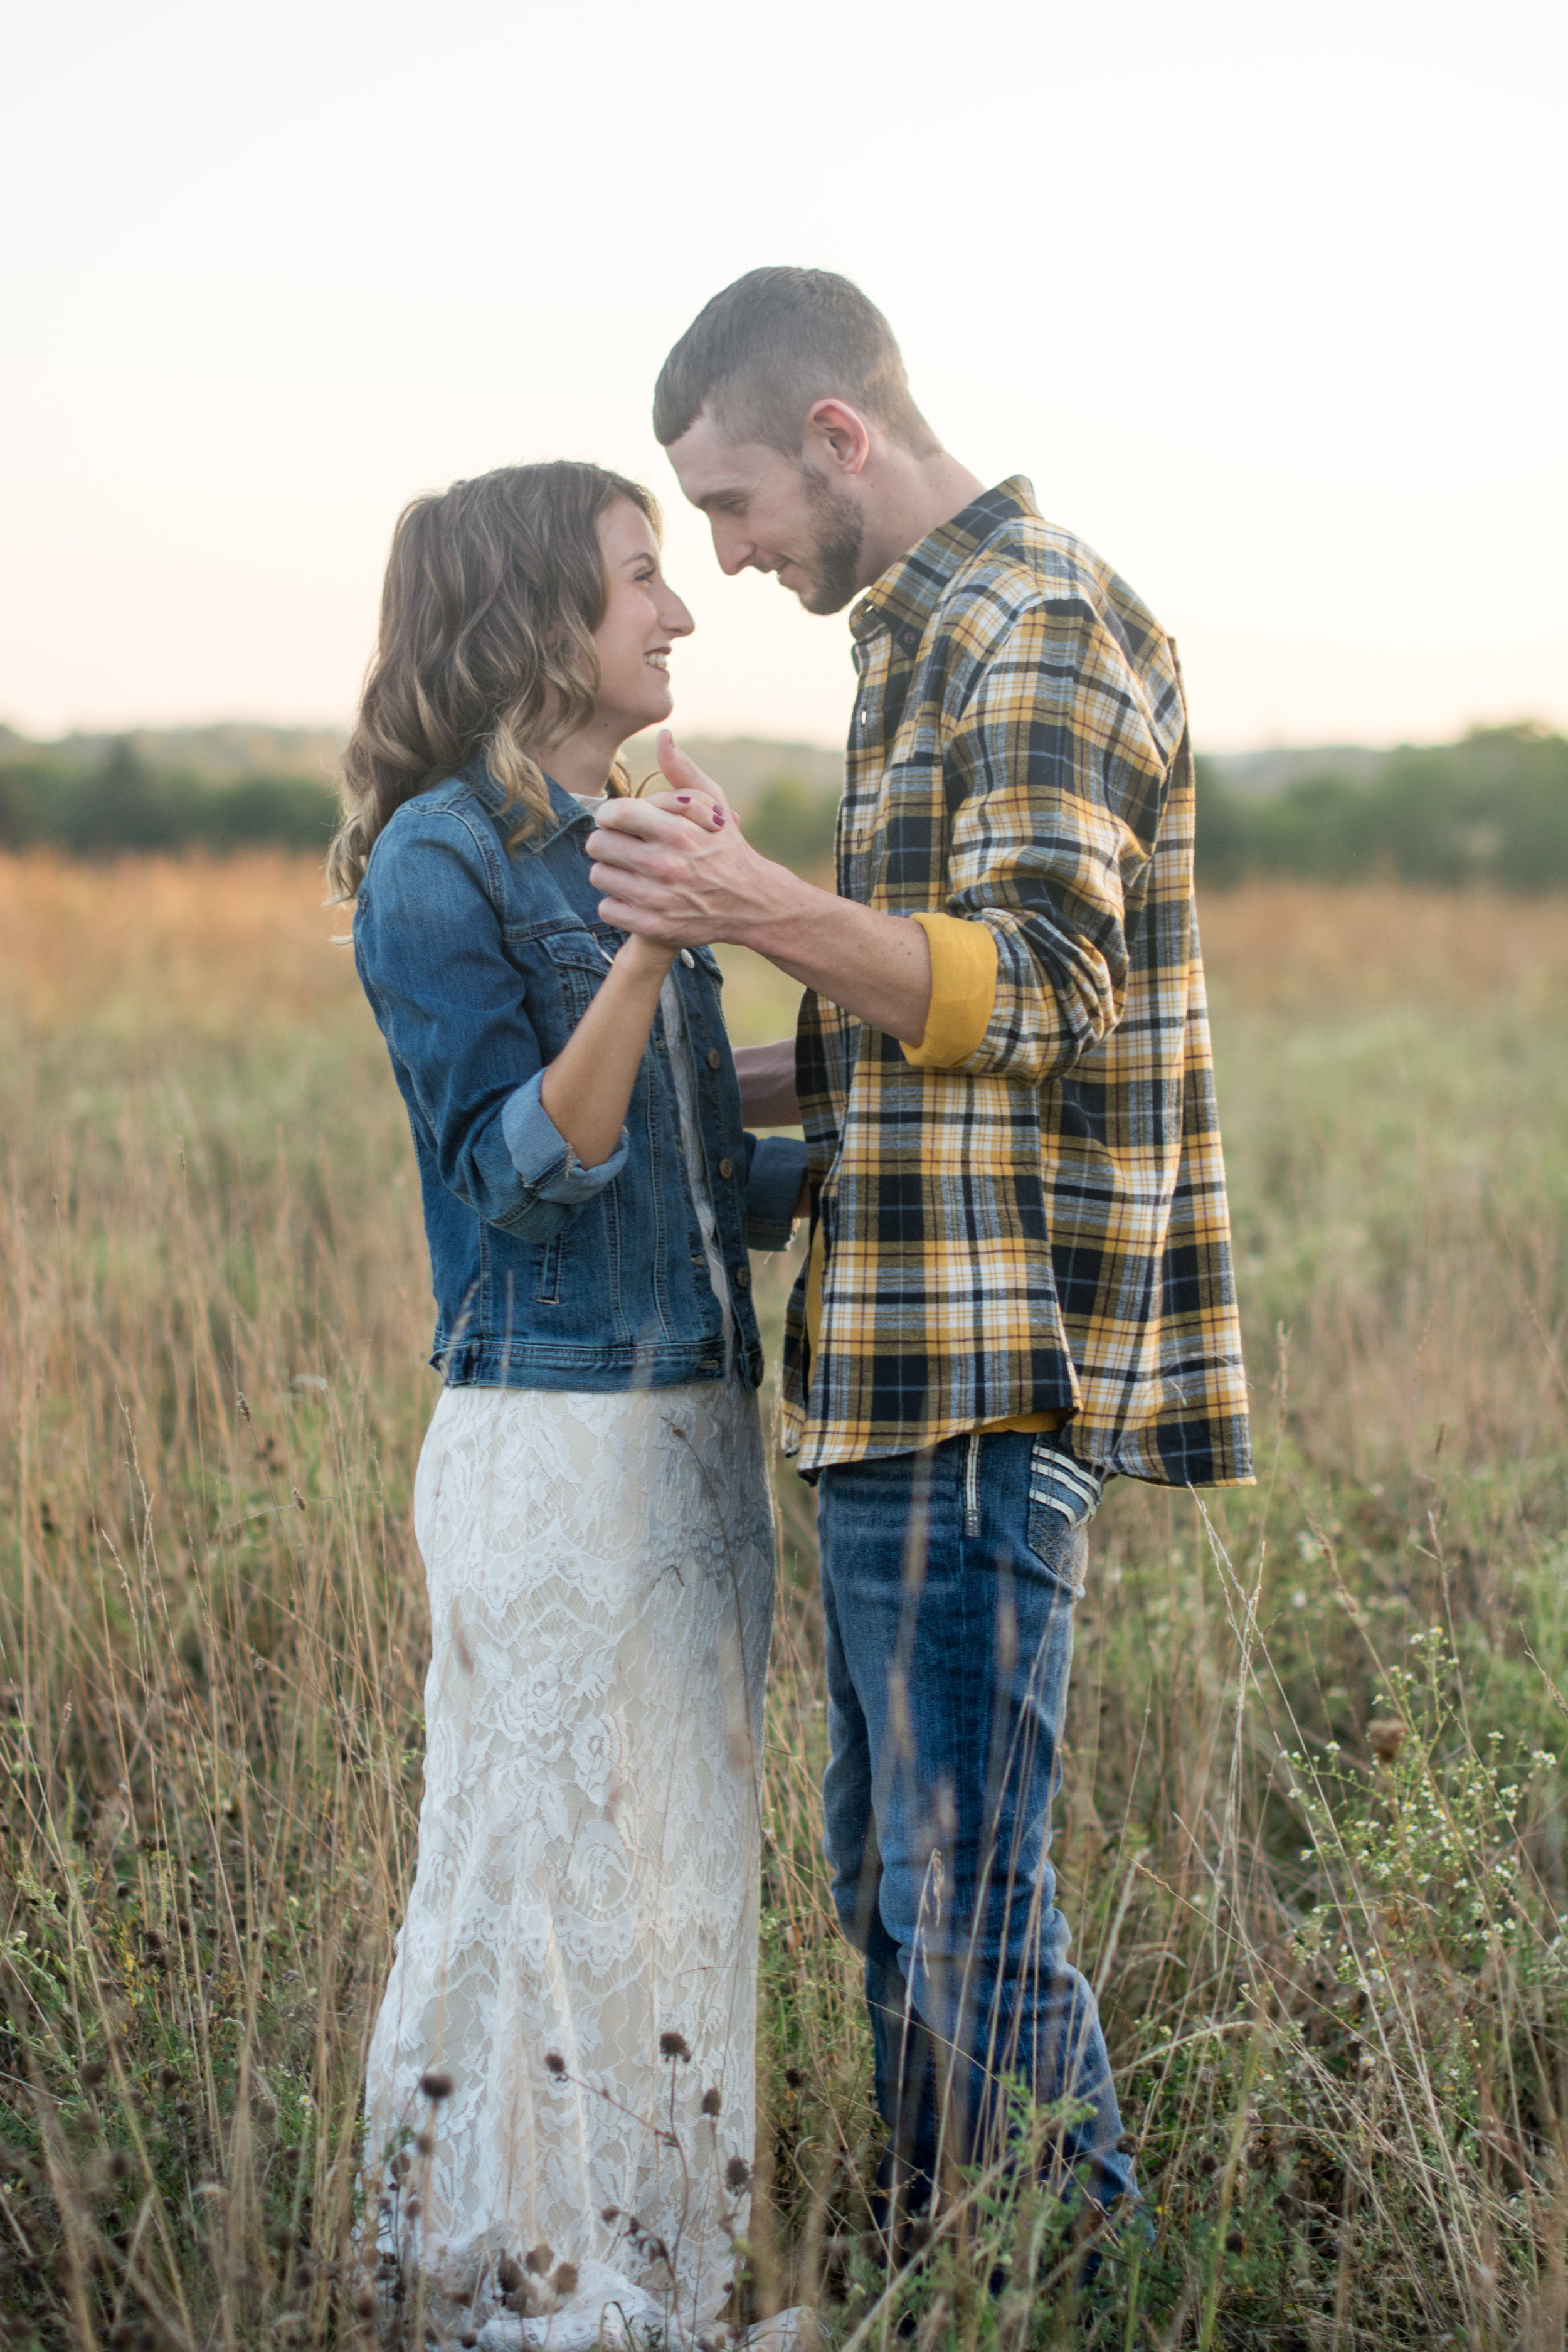 Tiffany-and-Chad-Engagement-82.jpg